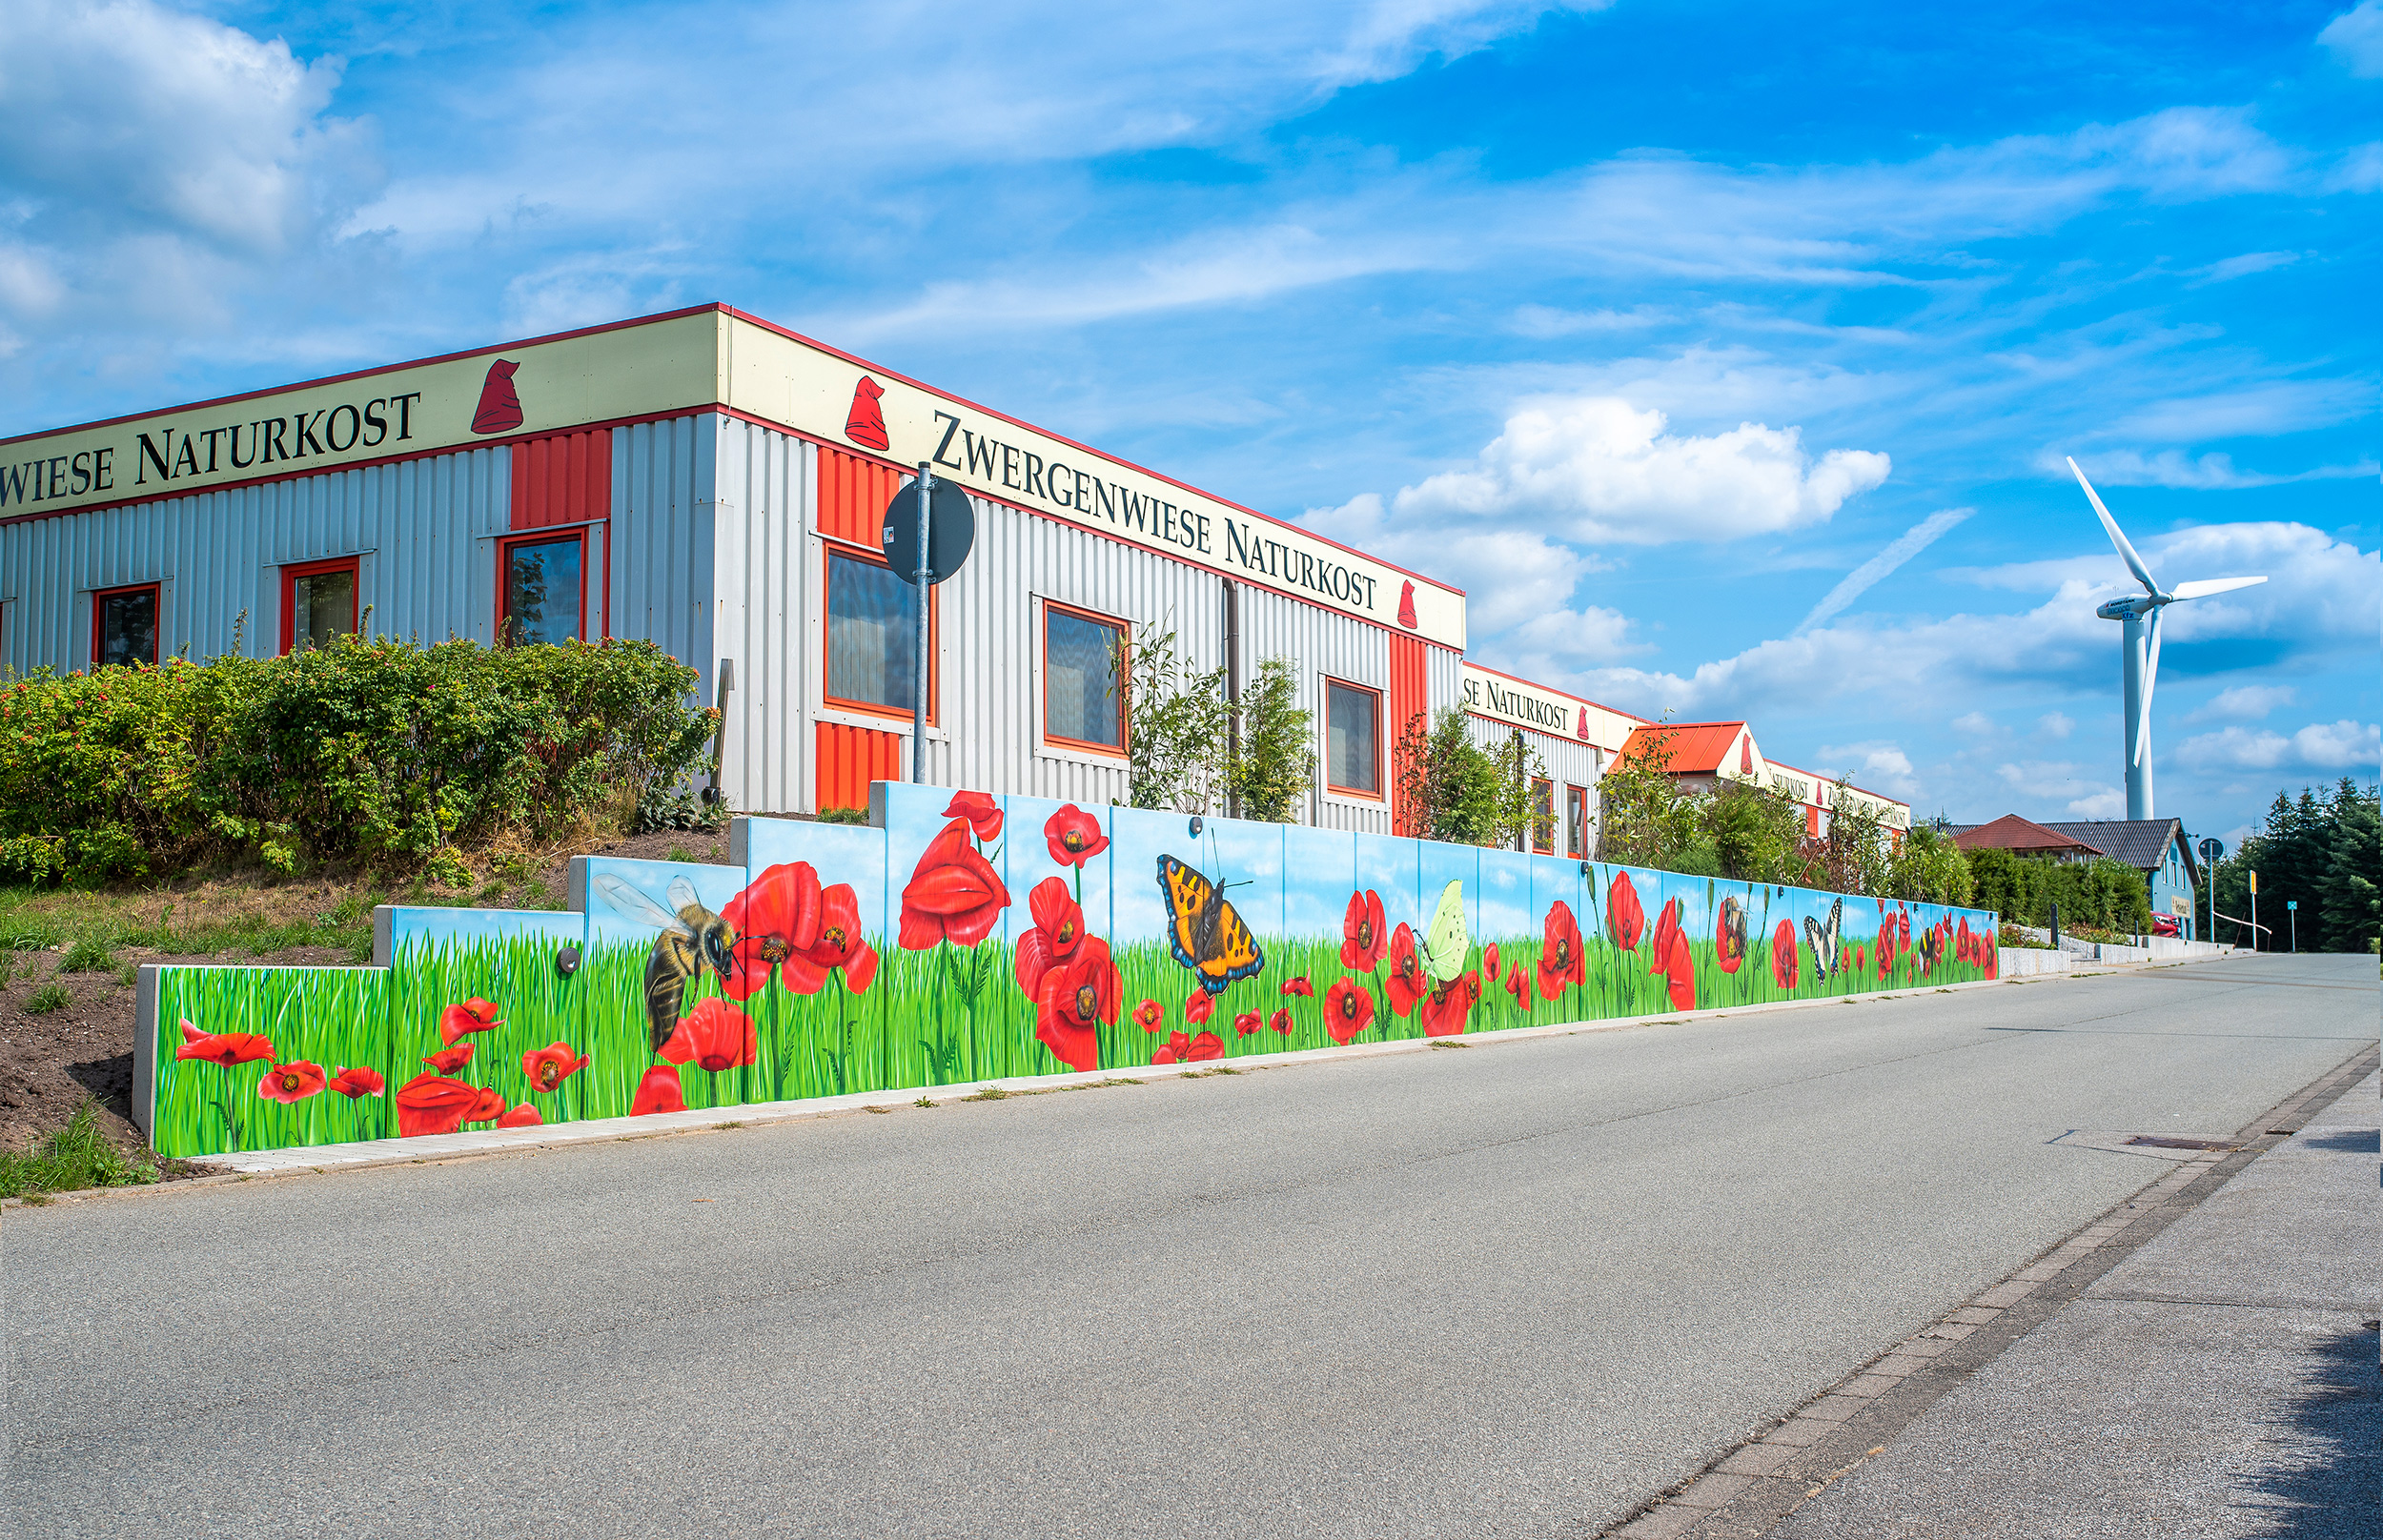 Graffiti maler graffiti k nstler f r fassadengestaltung und wandmalerei - Graffiti zimmerwand ...